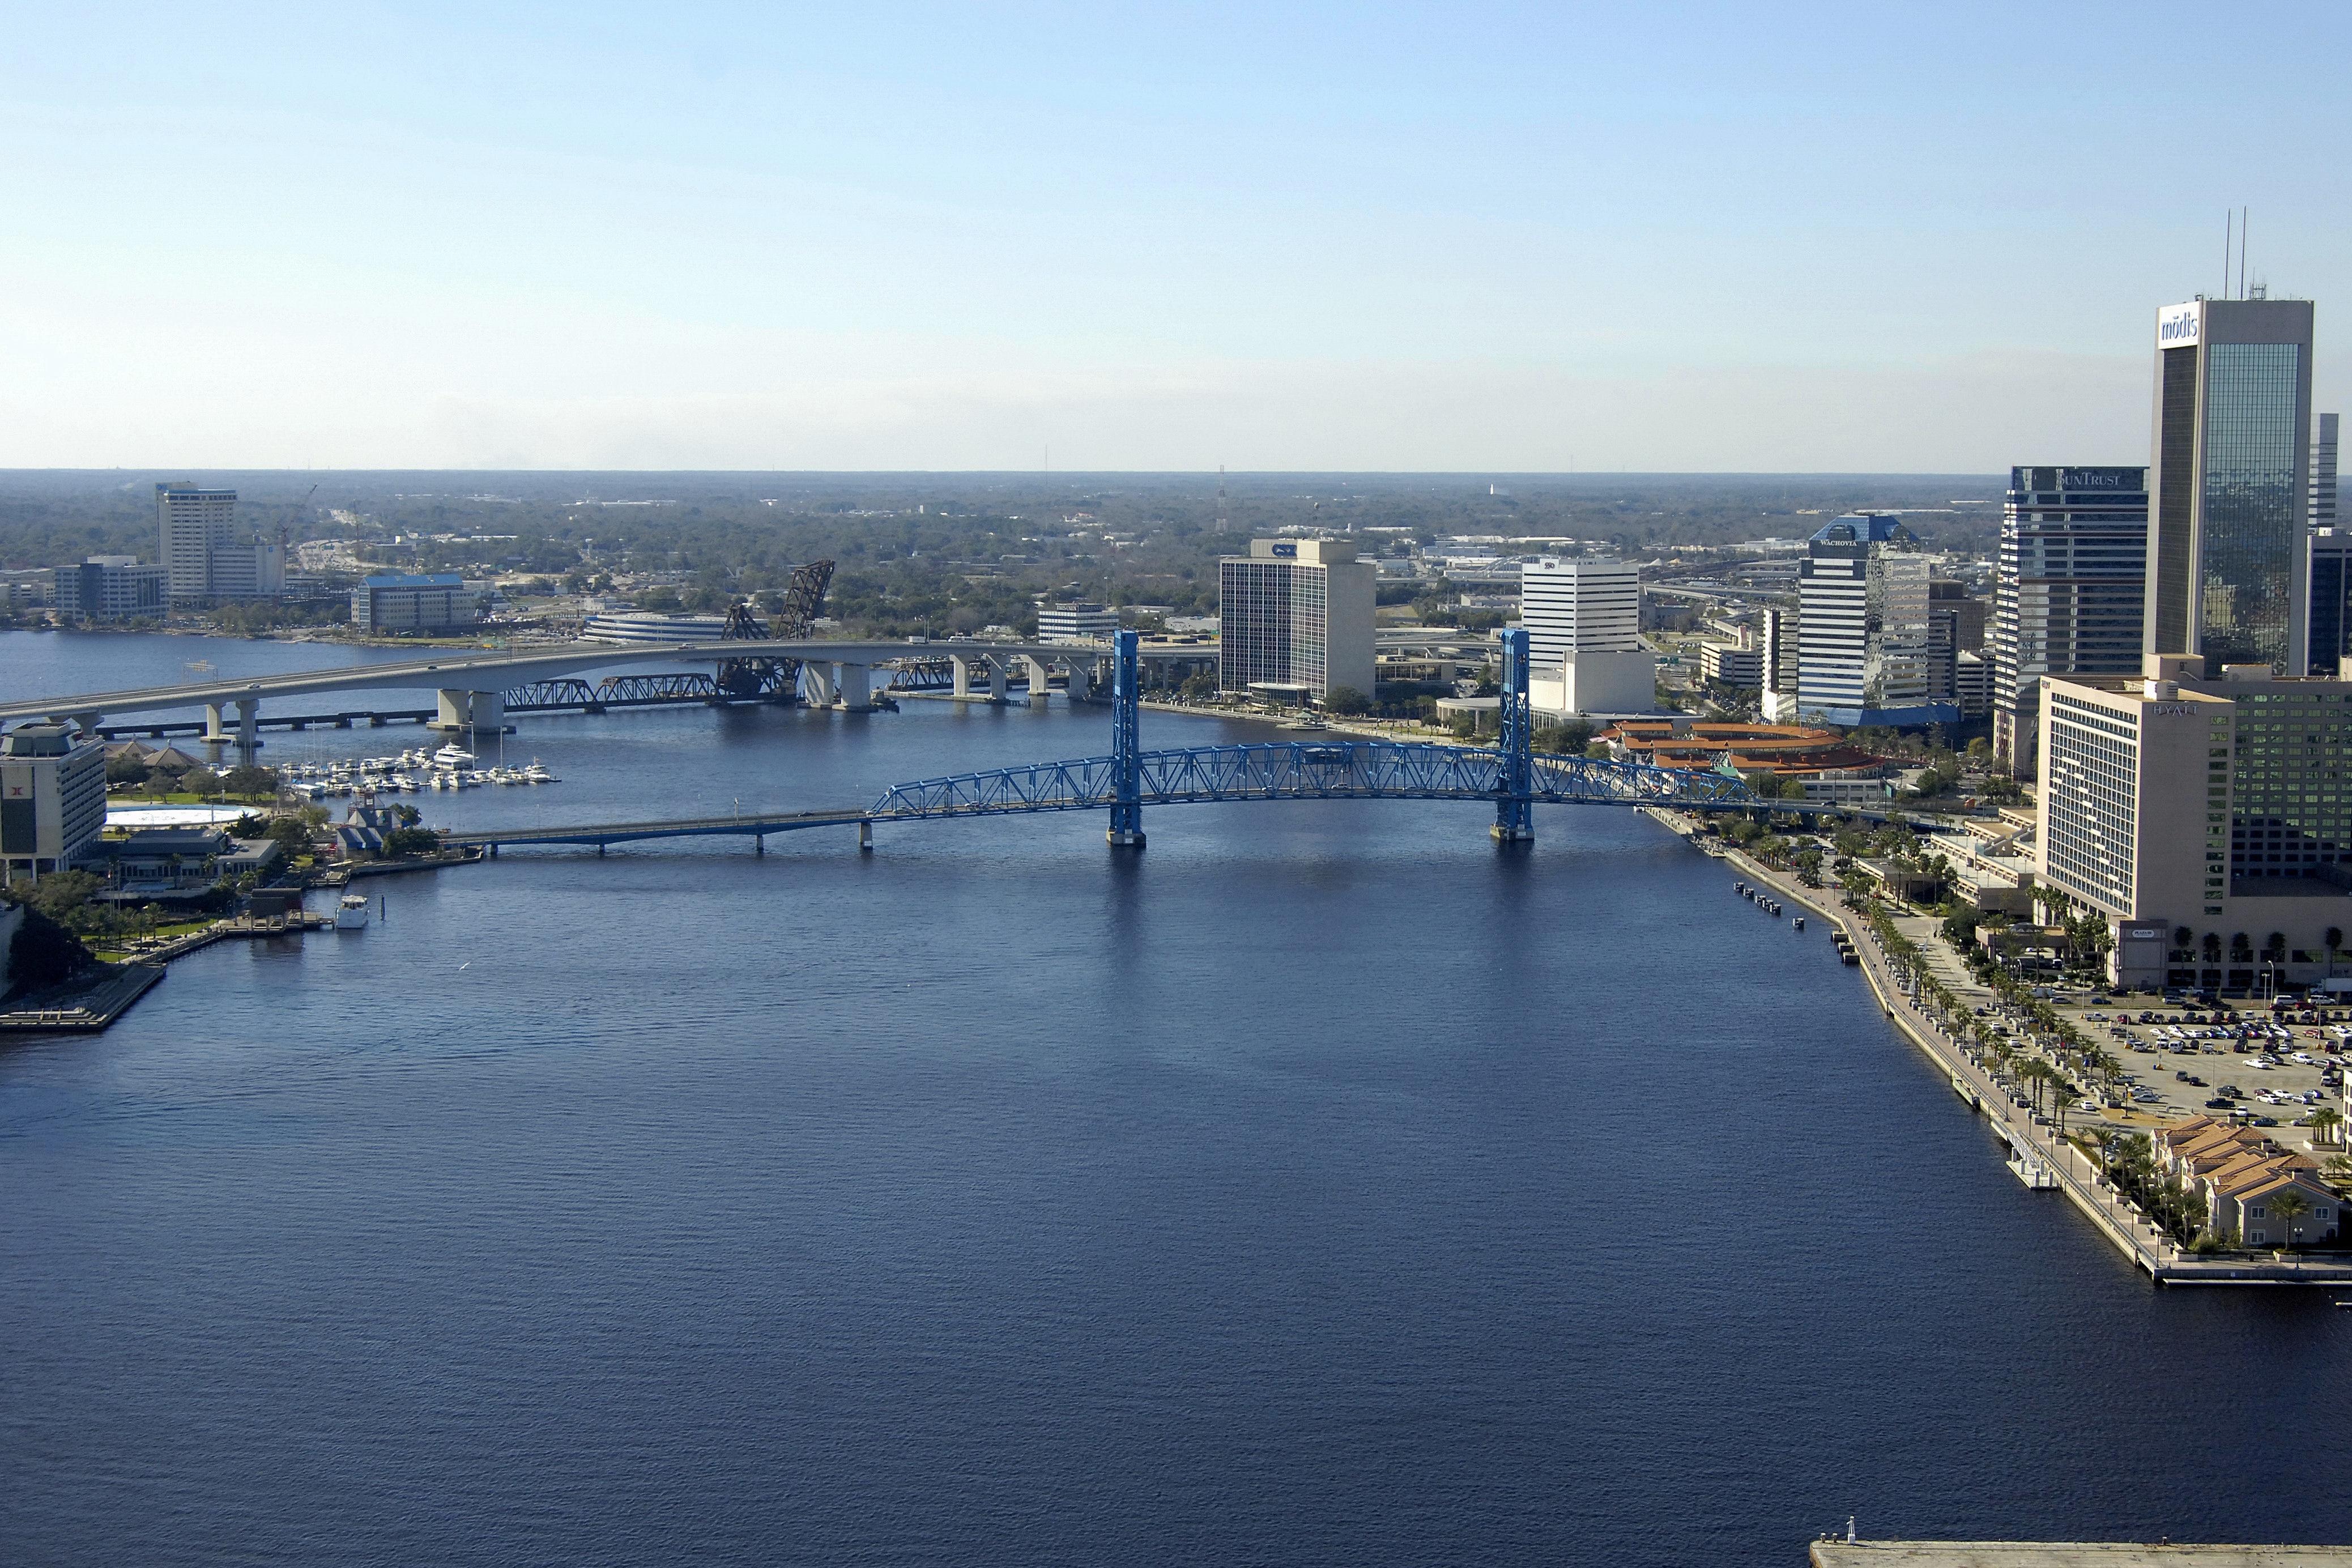 Main Street Bridge in Jacksonville, FL, United States - bridge Reviews - Phone Number - Marinas.com